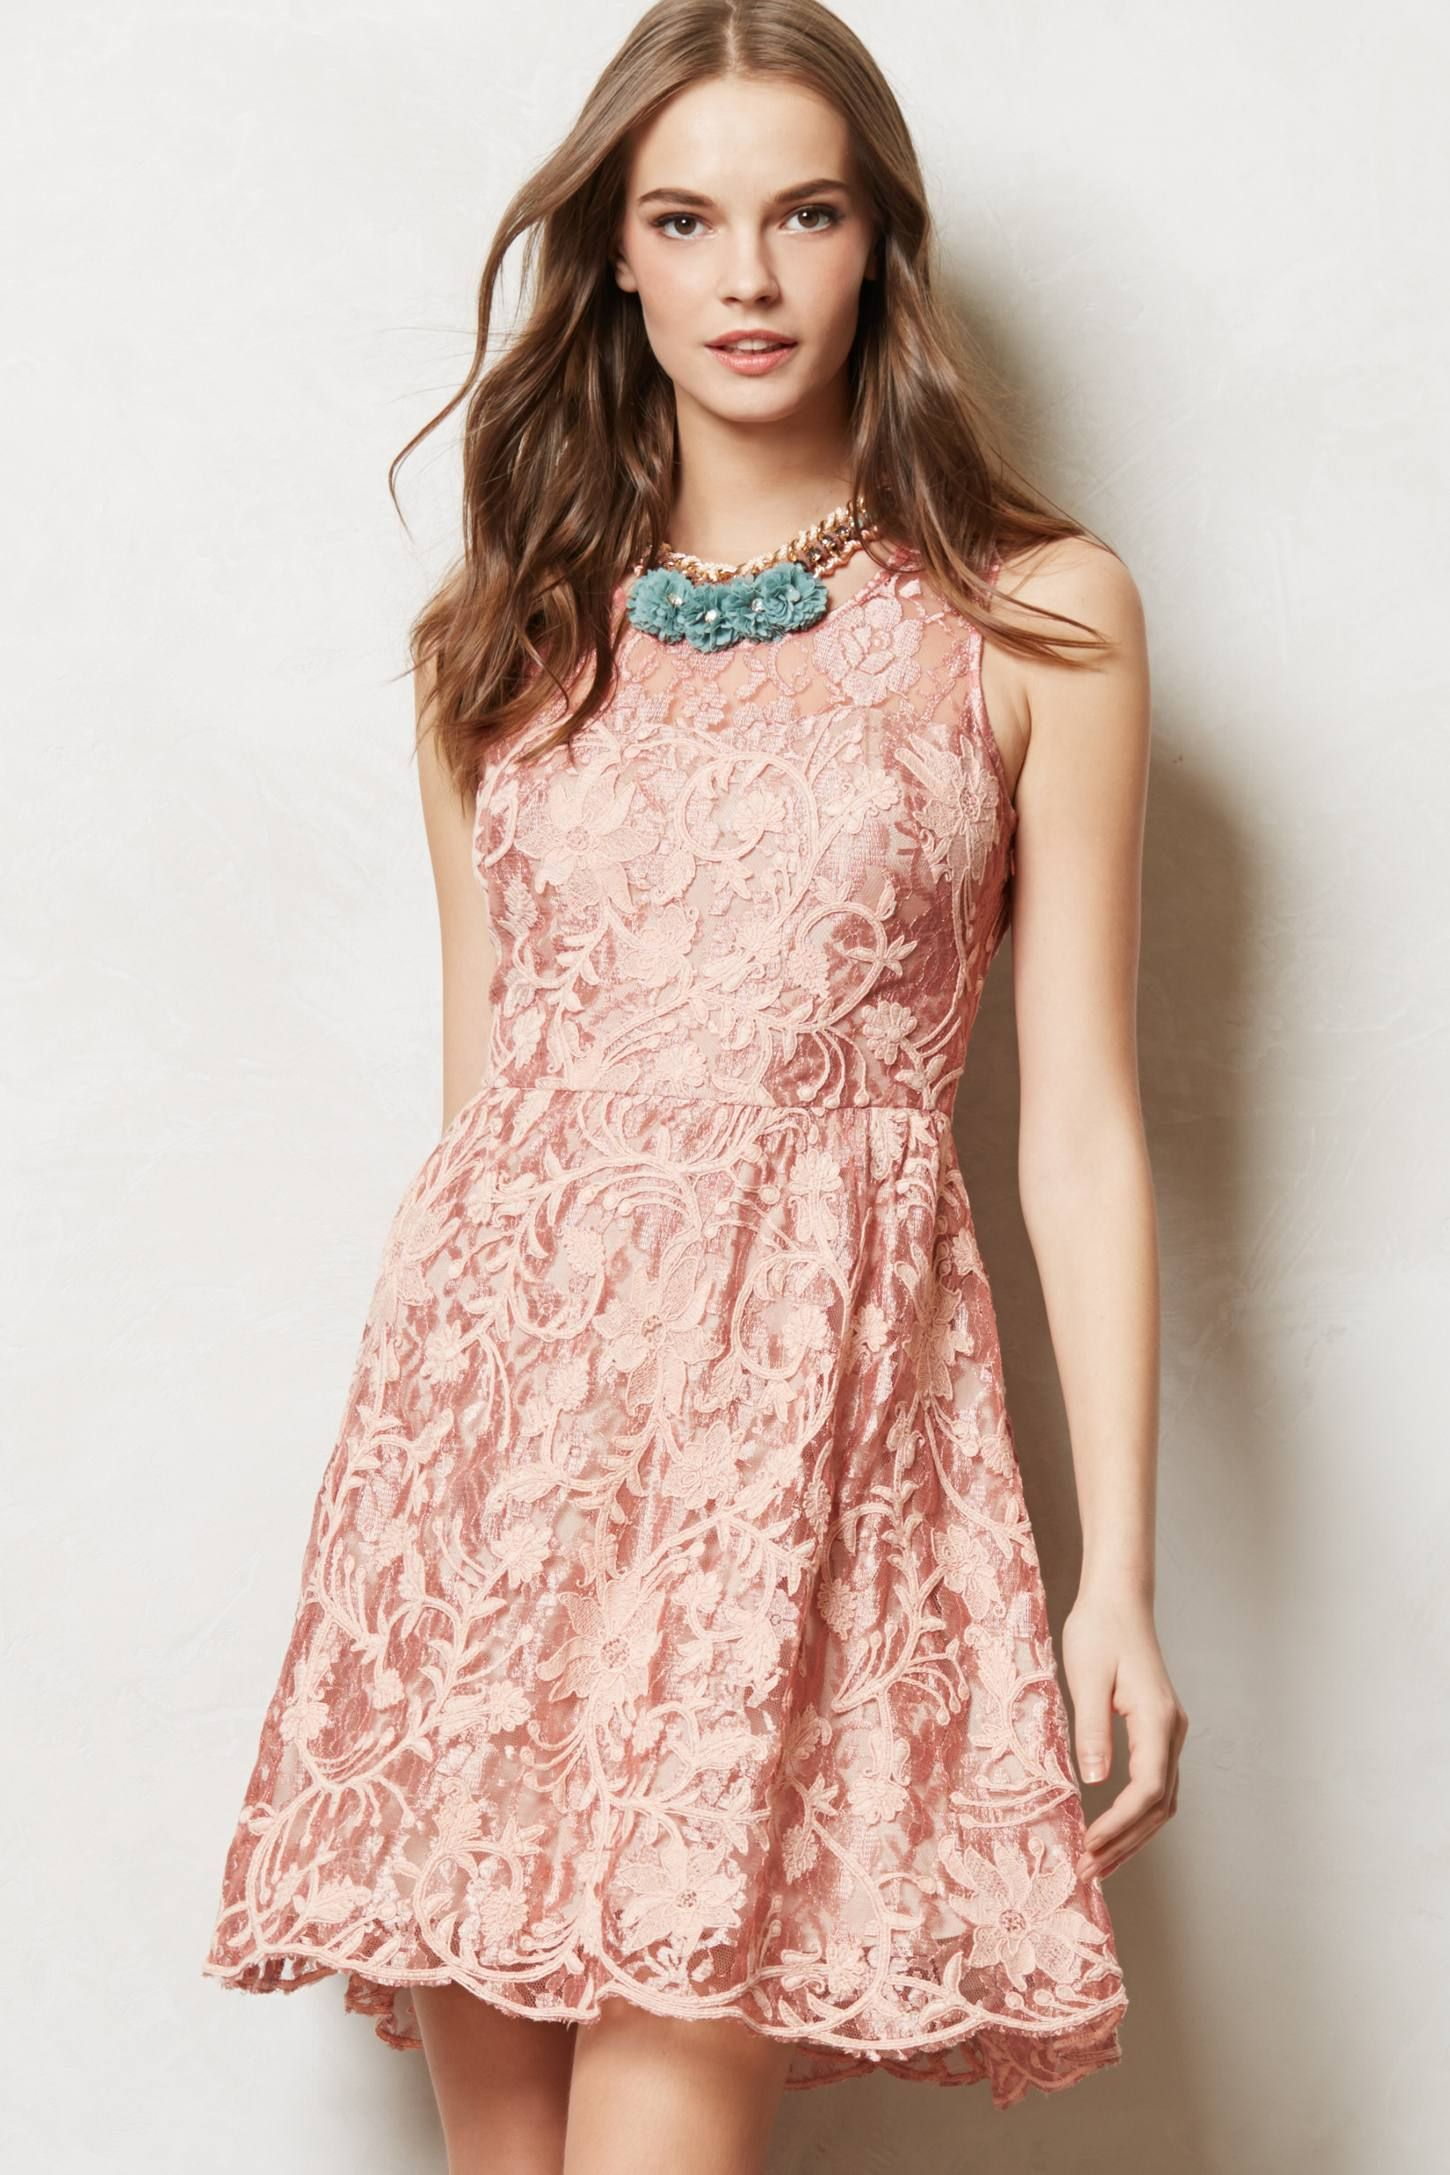 Fioritura Dress - anthropologie.com | Theoretical Closet | Pinterest ...